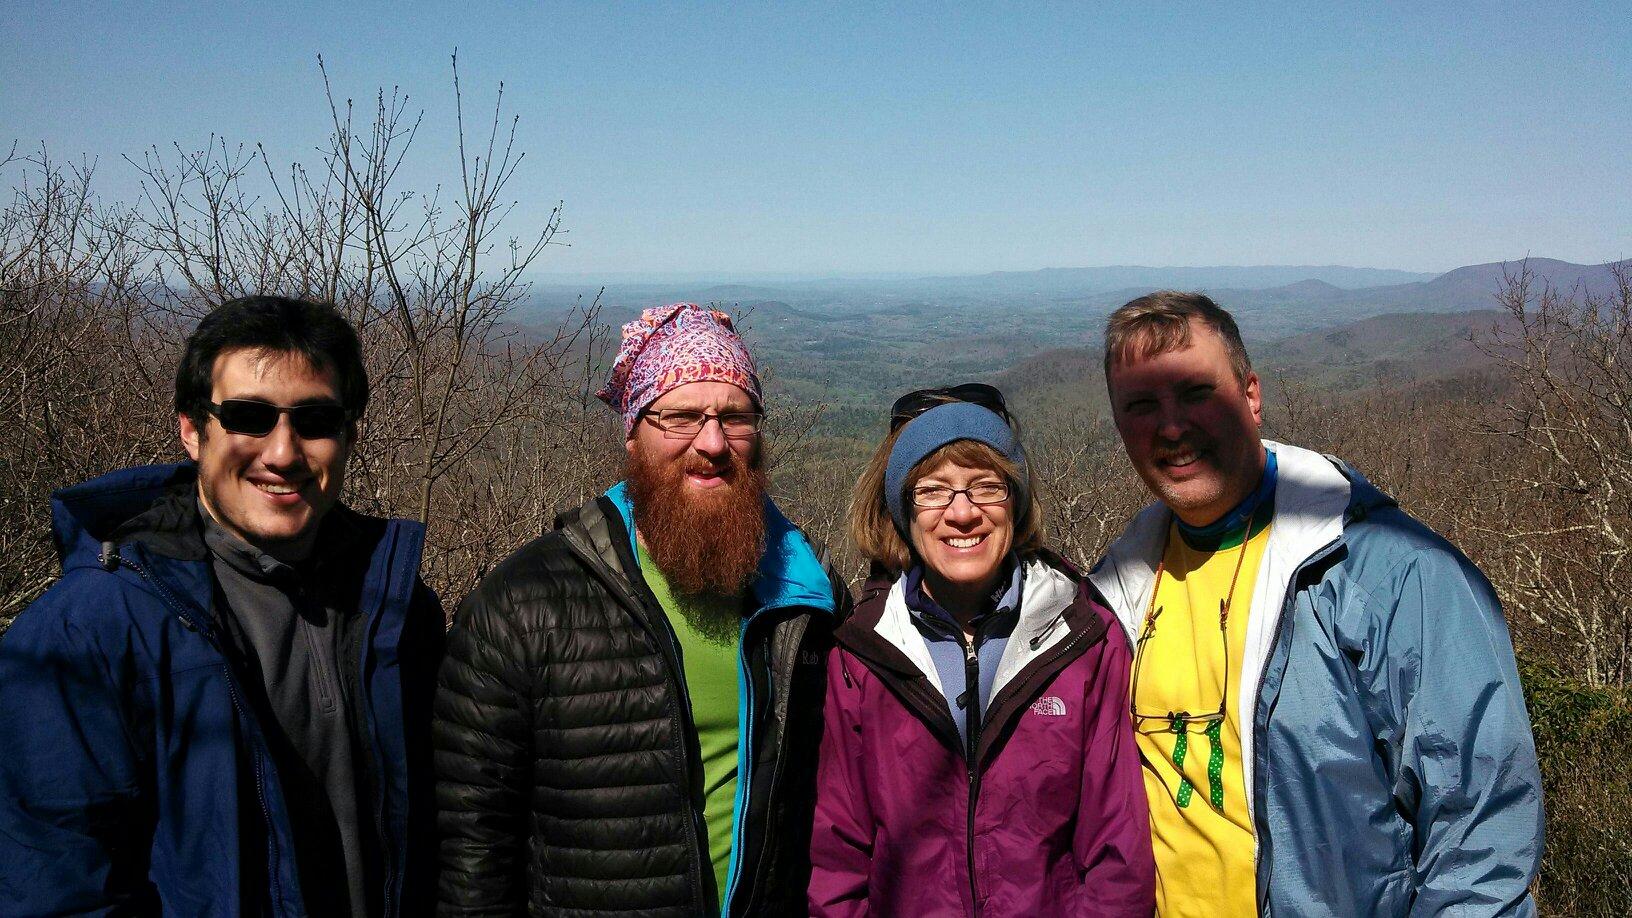 Josh, Ryan, Sue & Jeff at the Appalchian Trail starting point in Springer Mountain Georgia